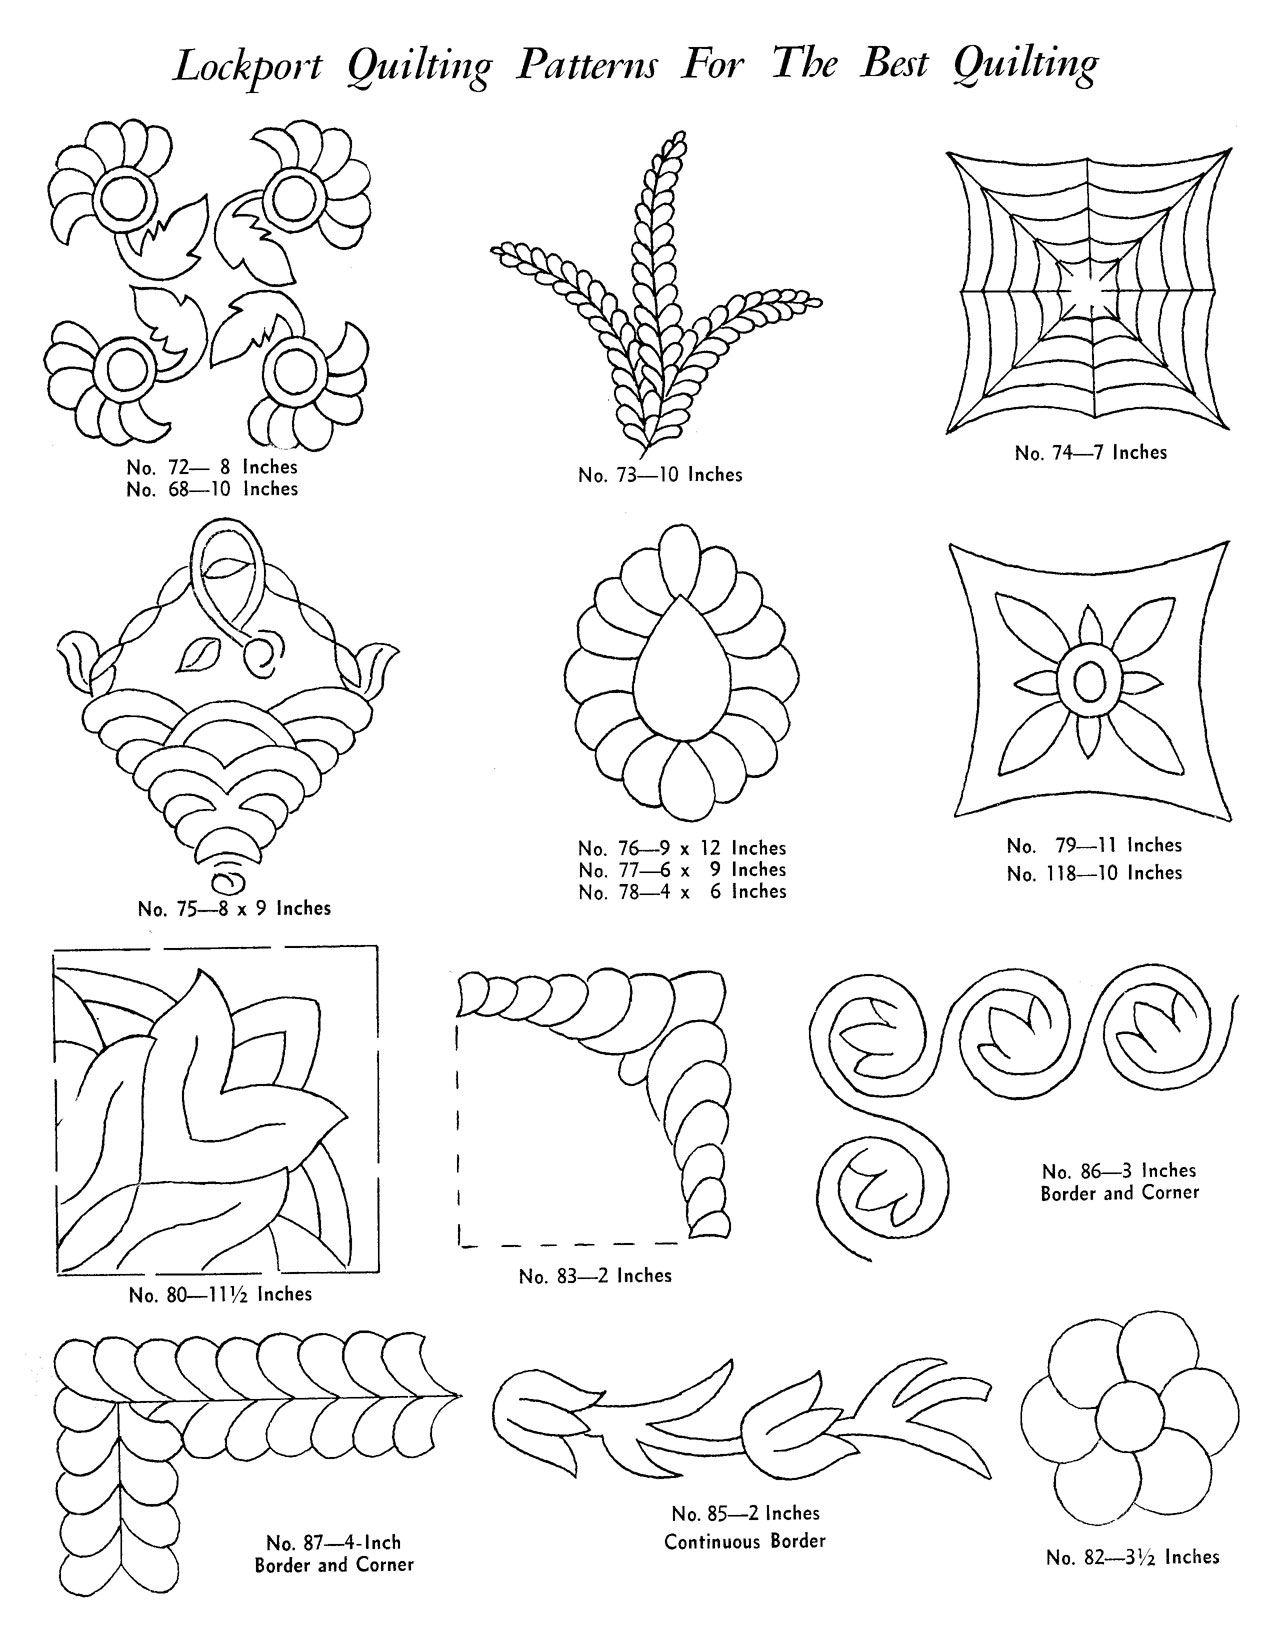 Lockport Hand Quilting Pattern Catalog Hand Quilting Patterns Hand Quilting Designs Hand Quilting